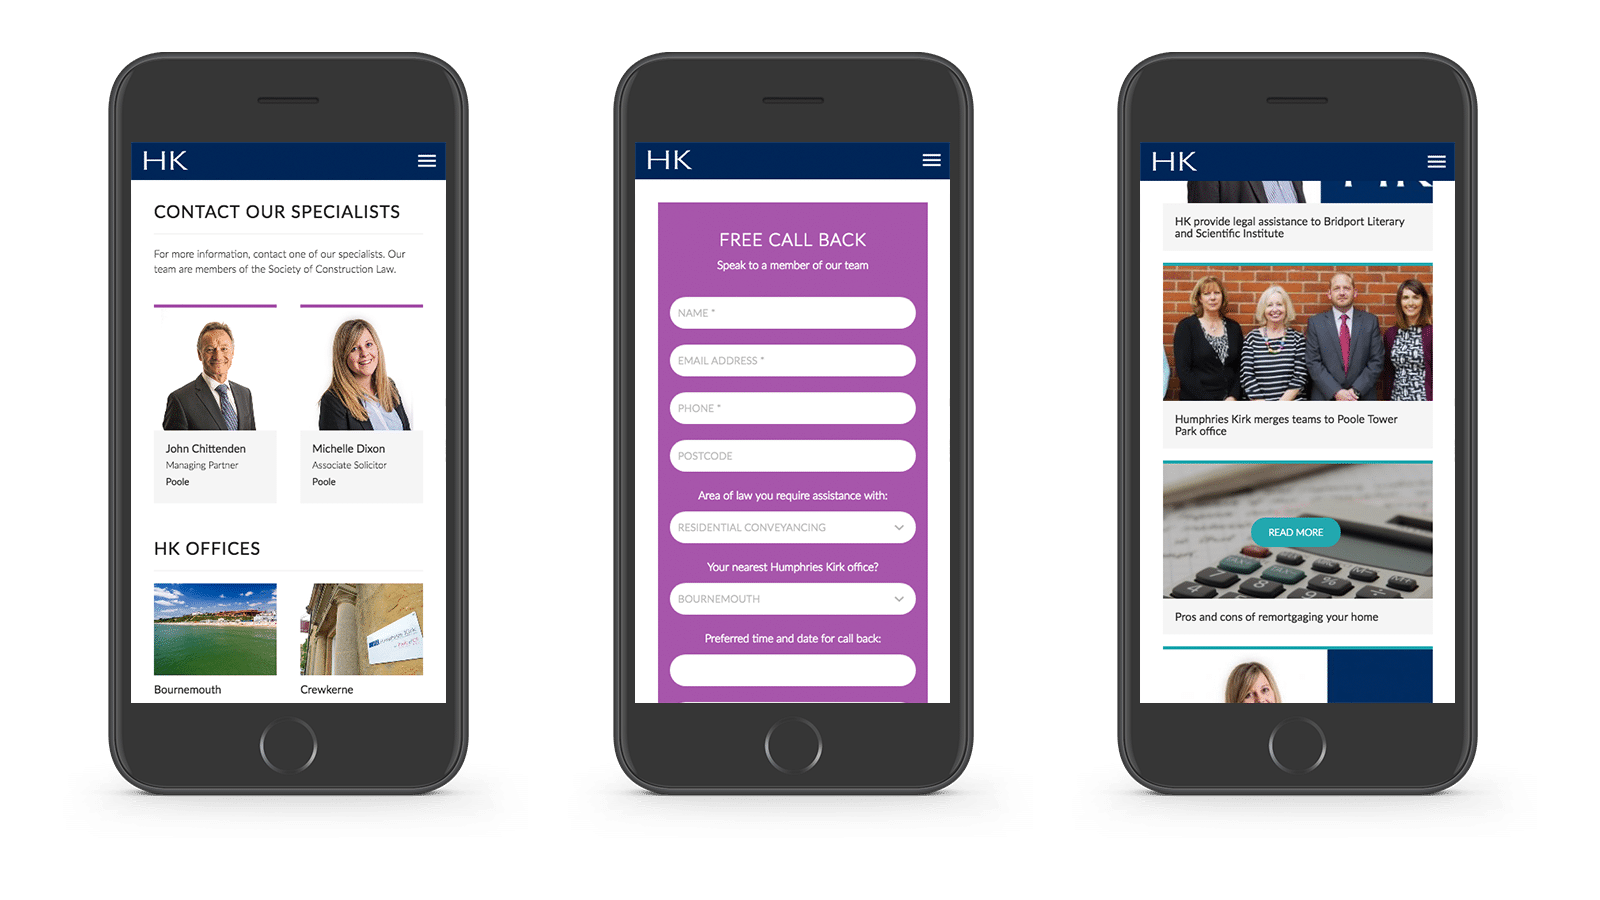 Humphries Kirk website mobile responsive